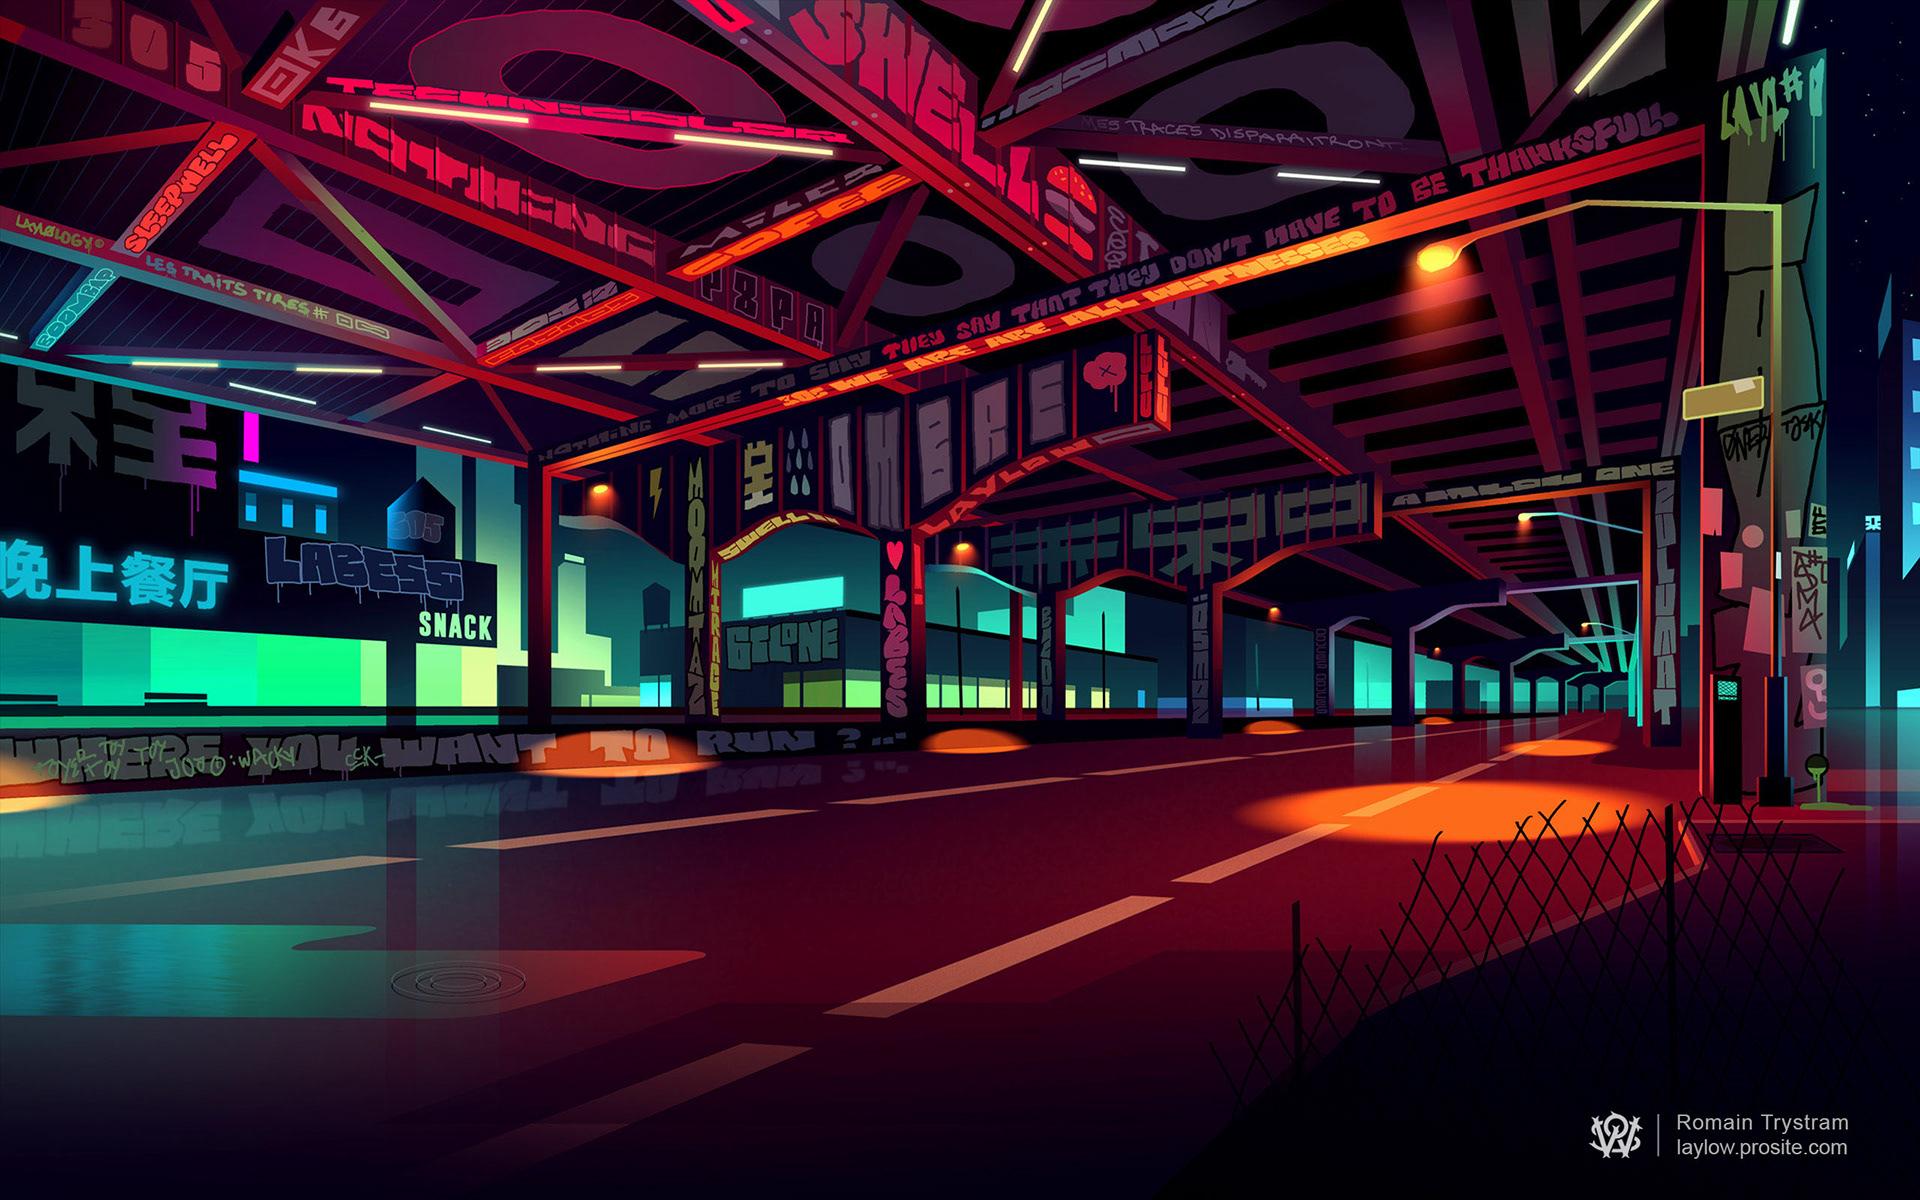 General 1920x1200 digital art cityscape city lights colorful street street light Romain Trystram